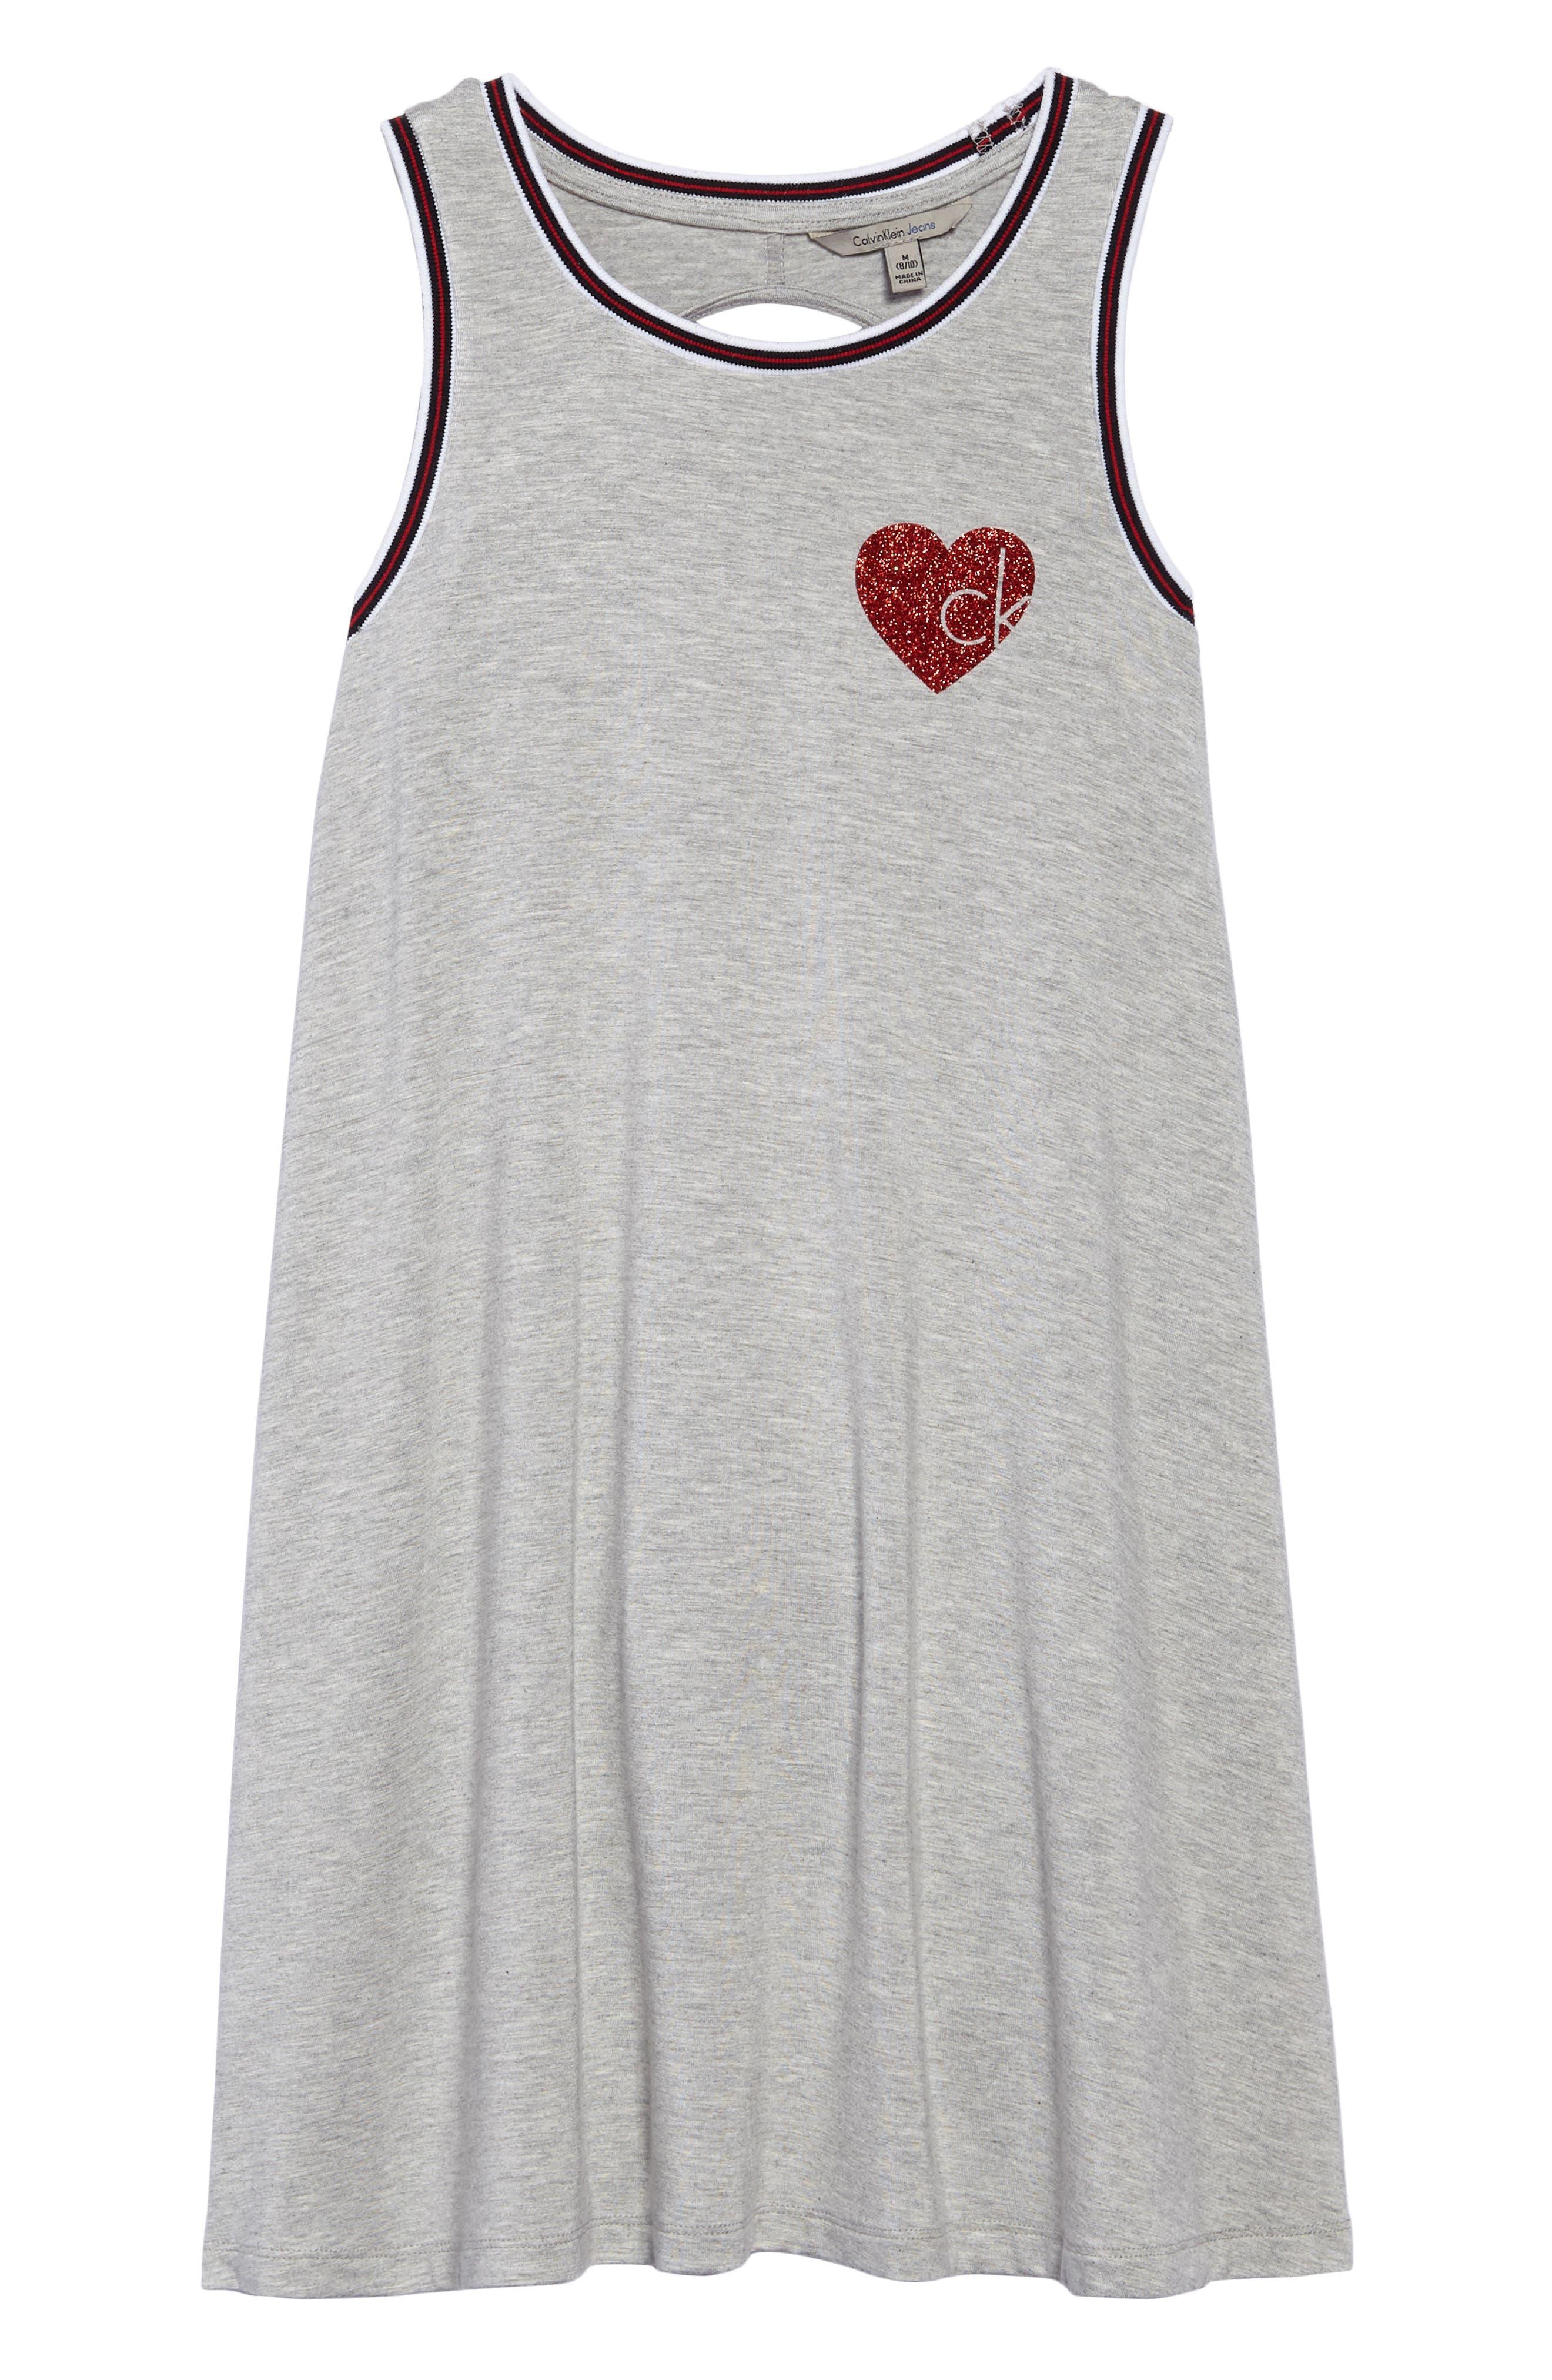 Athleisure Sleeveless Dress,                             Main thumbnail 1, color,                             Grey Heather